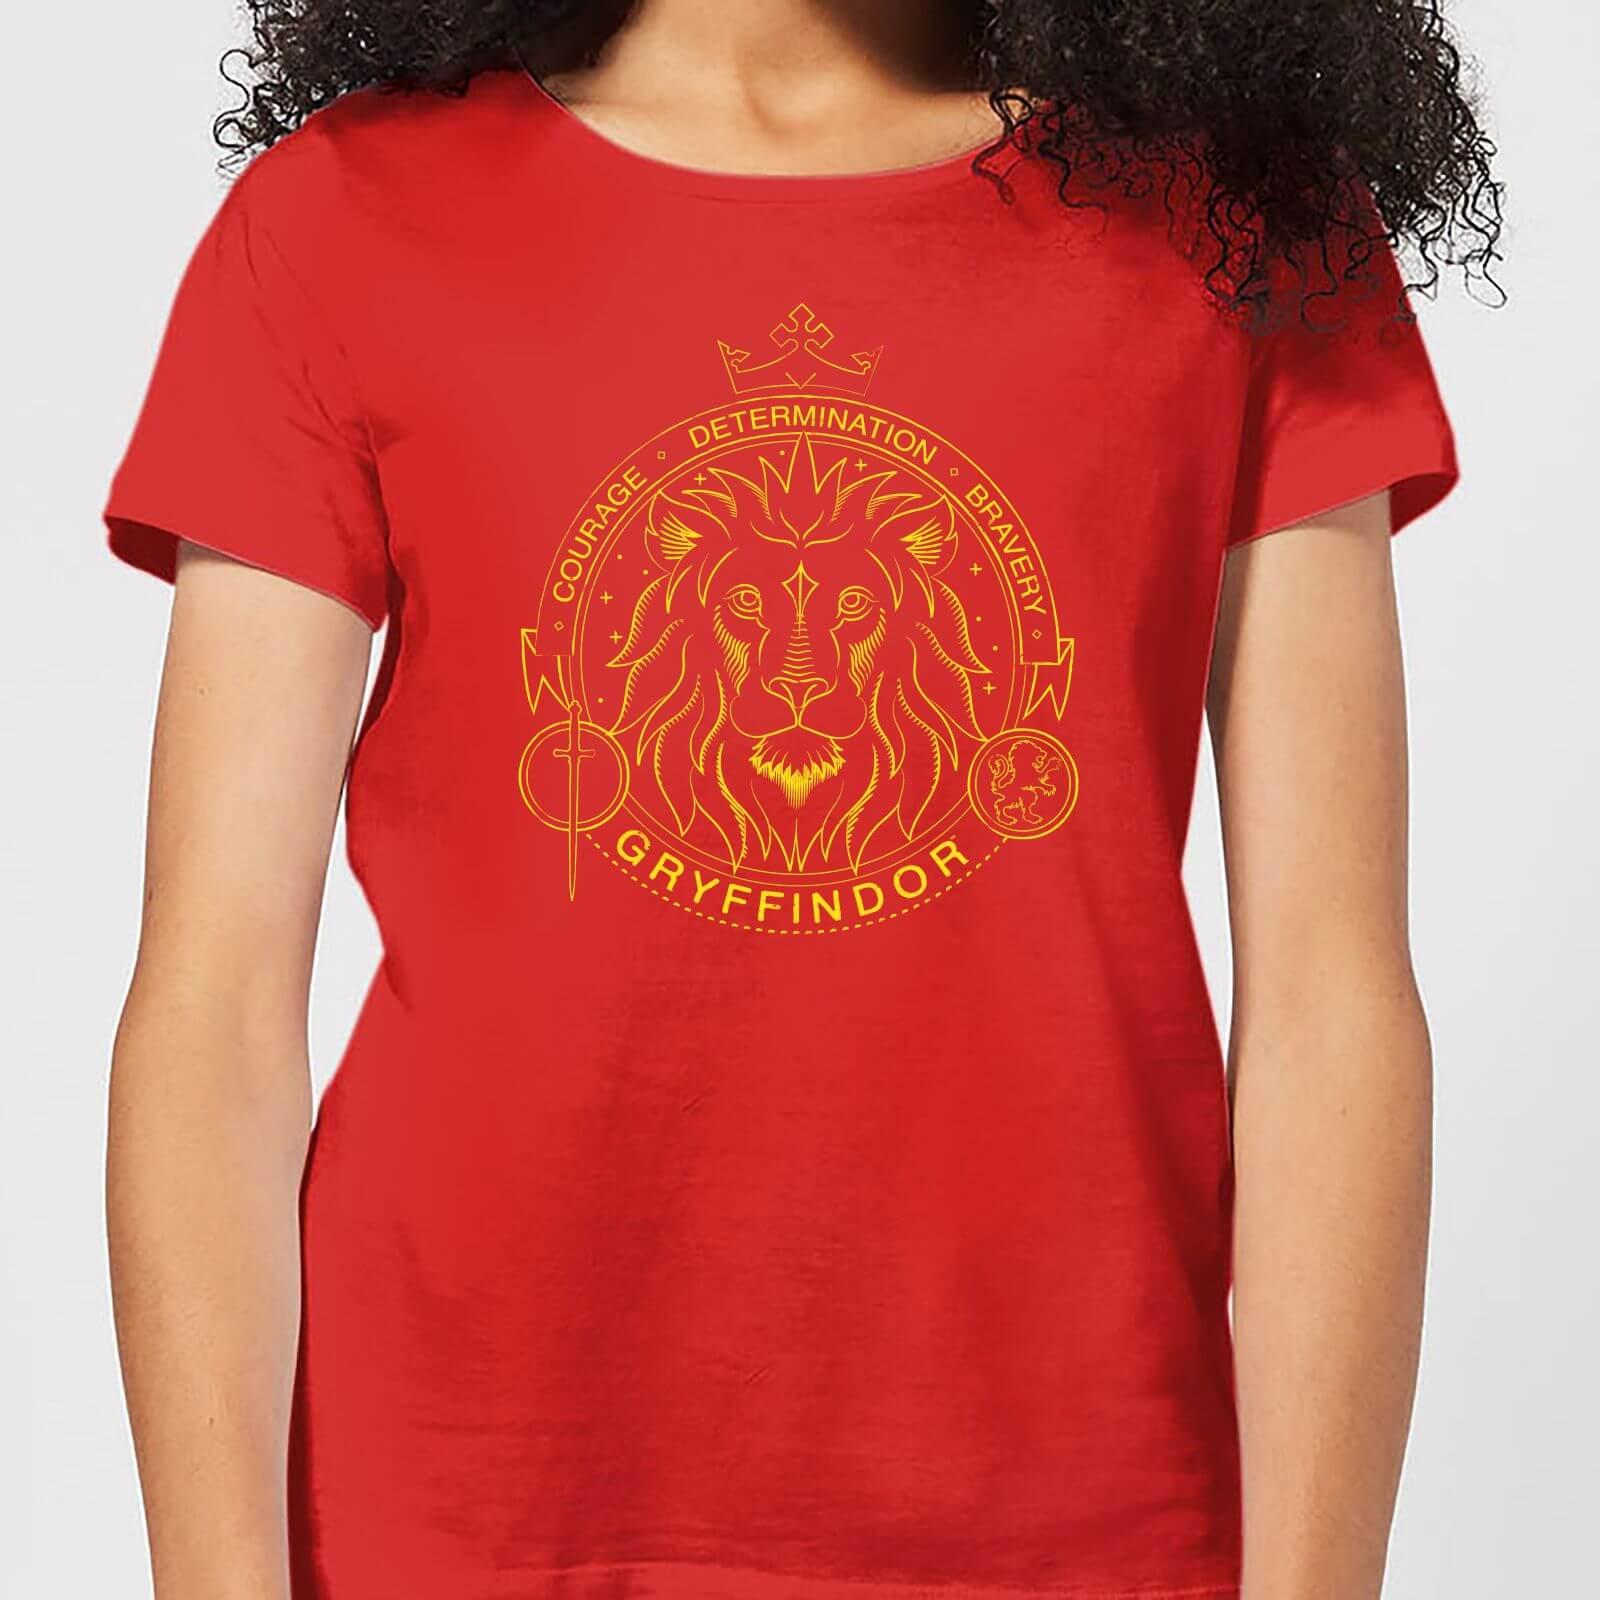 Harry Potter Gryffindor Lion Badge Women's T-Shirt - Red - L - Rouge